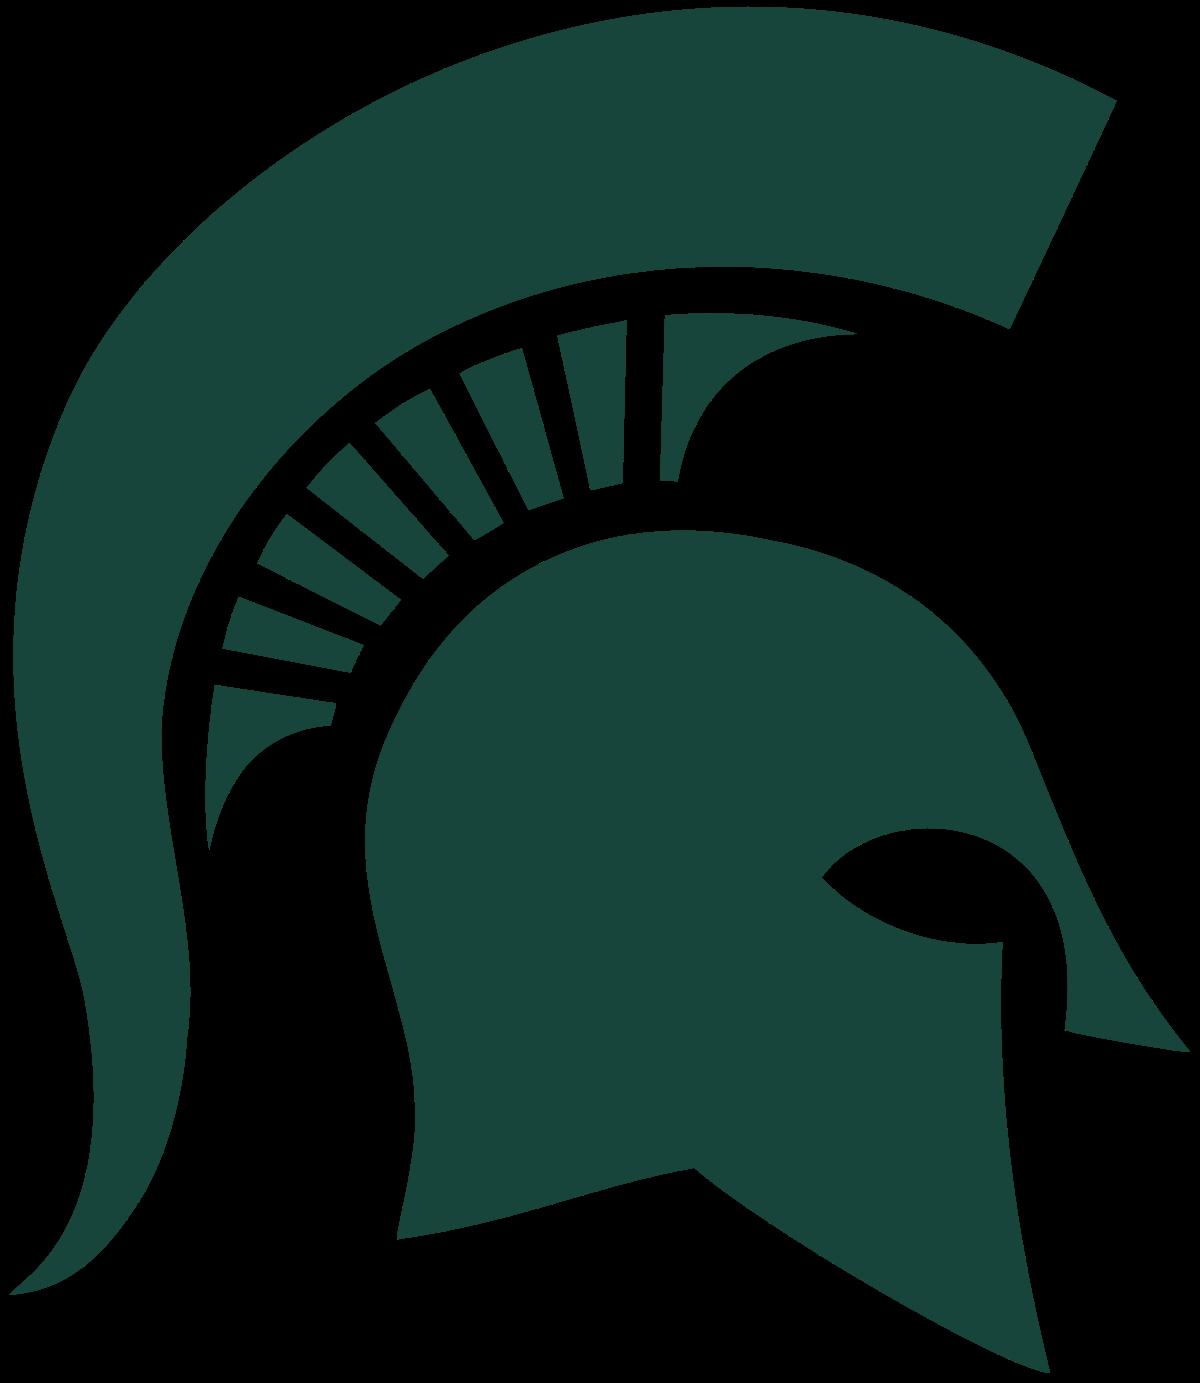 Michigan State Spartans Logo Michigan State Logo Michigan State Spartans Logo Michigan State Spartans Football